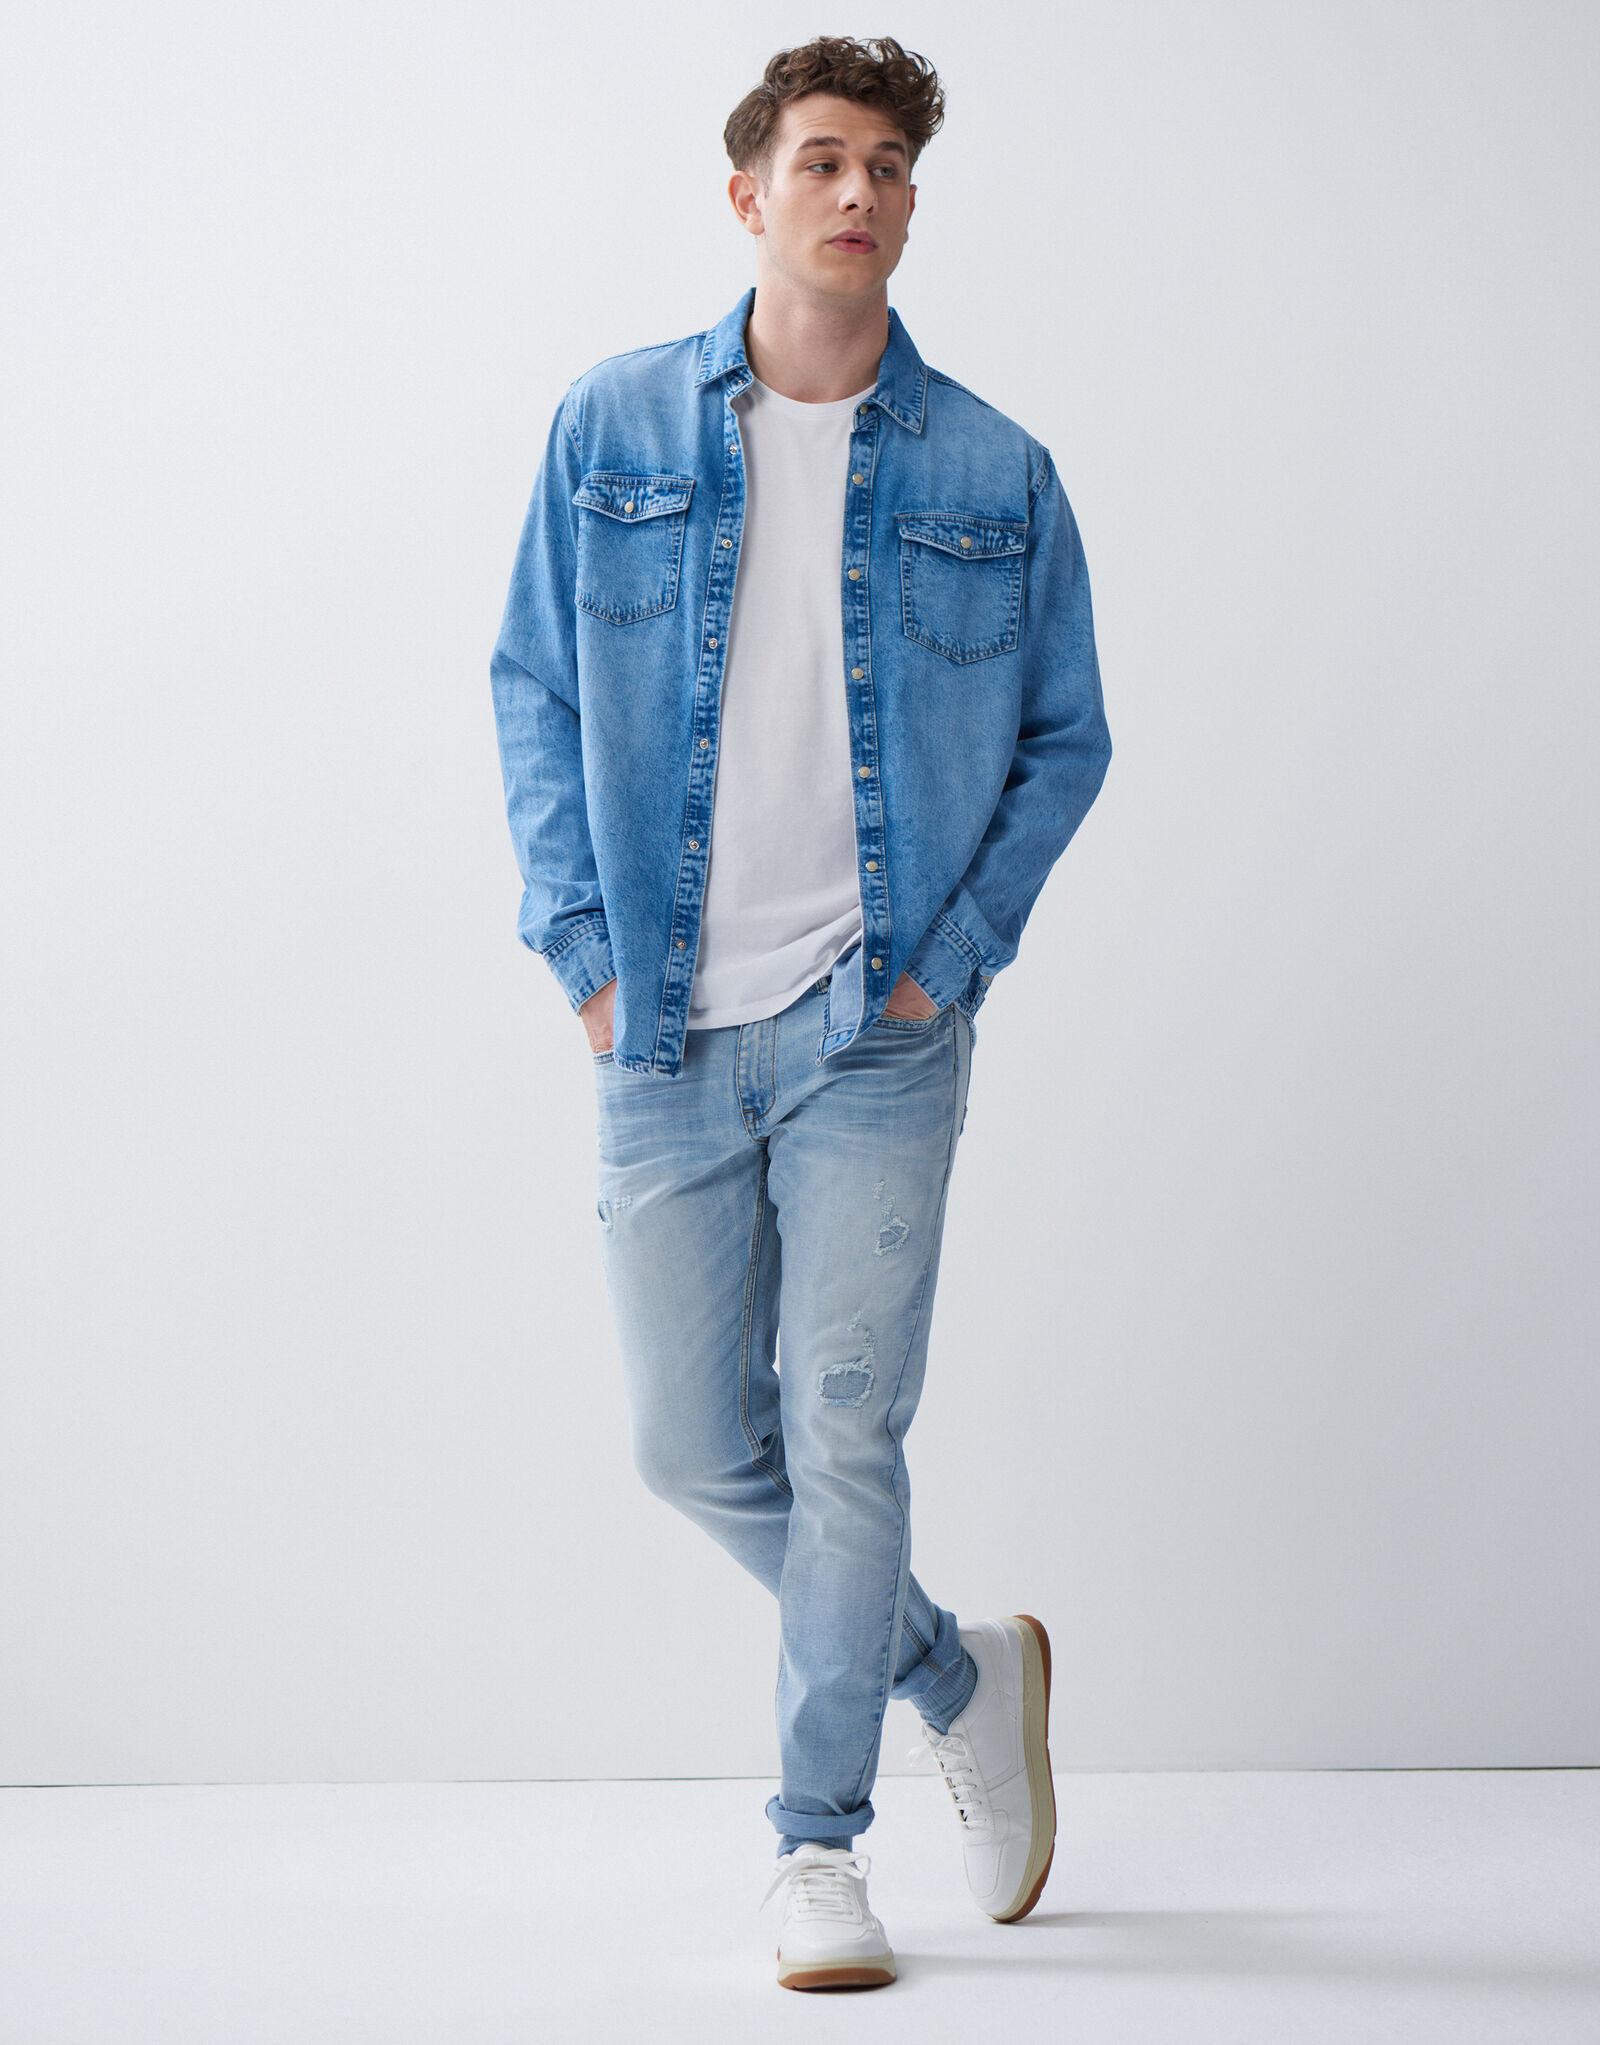 Leroy Skinny Binc Jeans L34